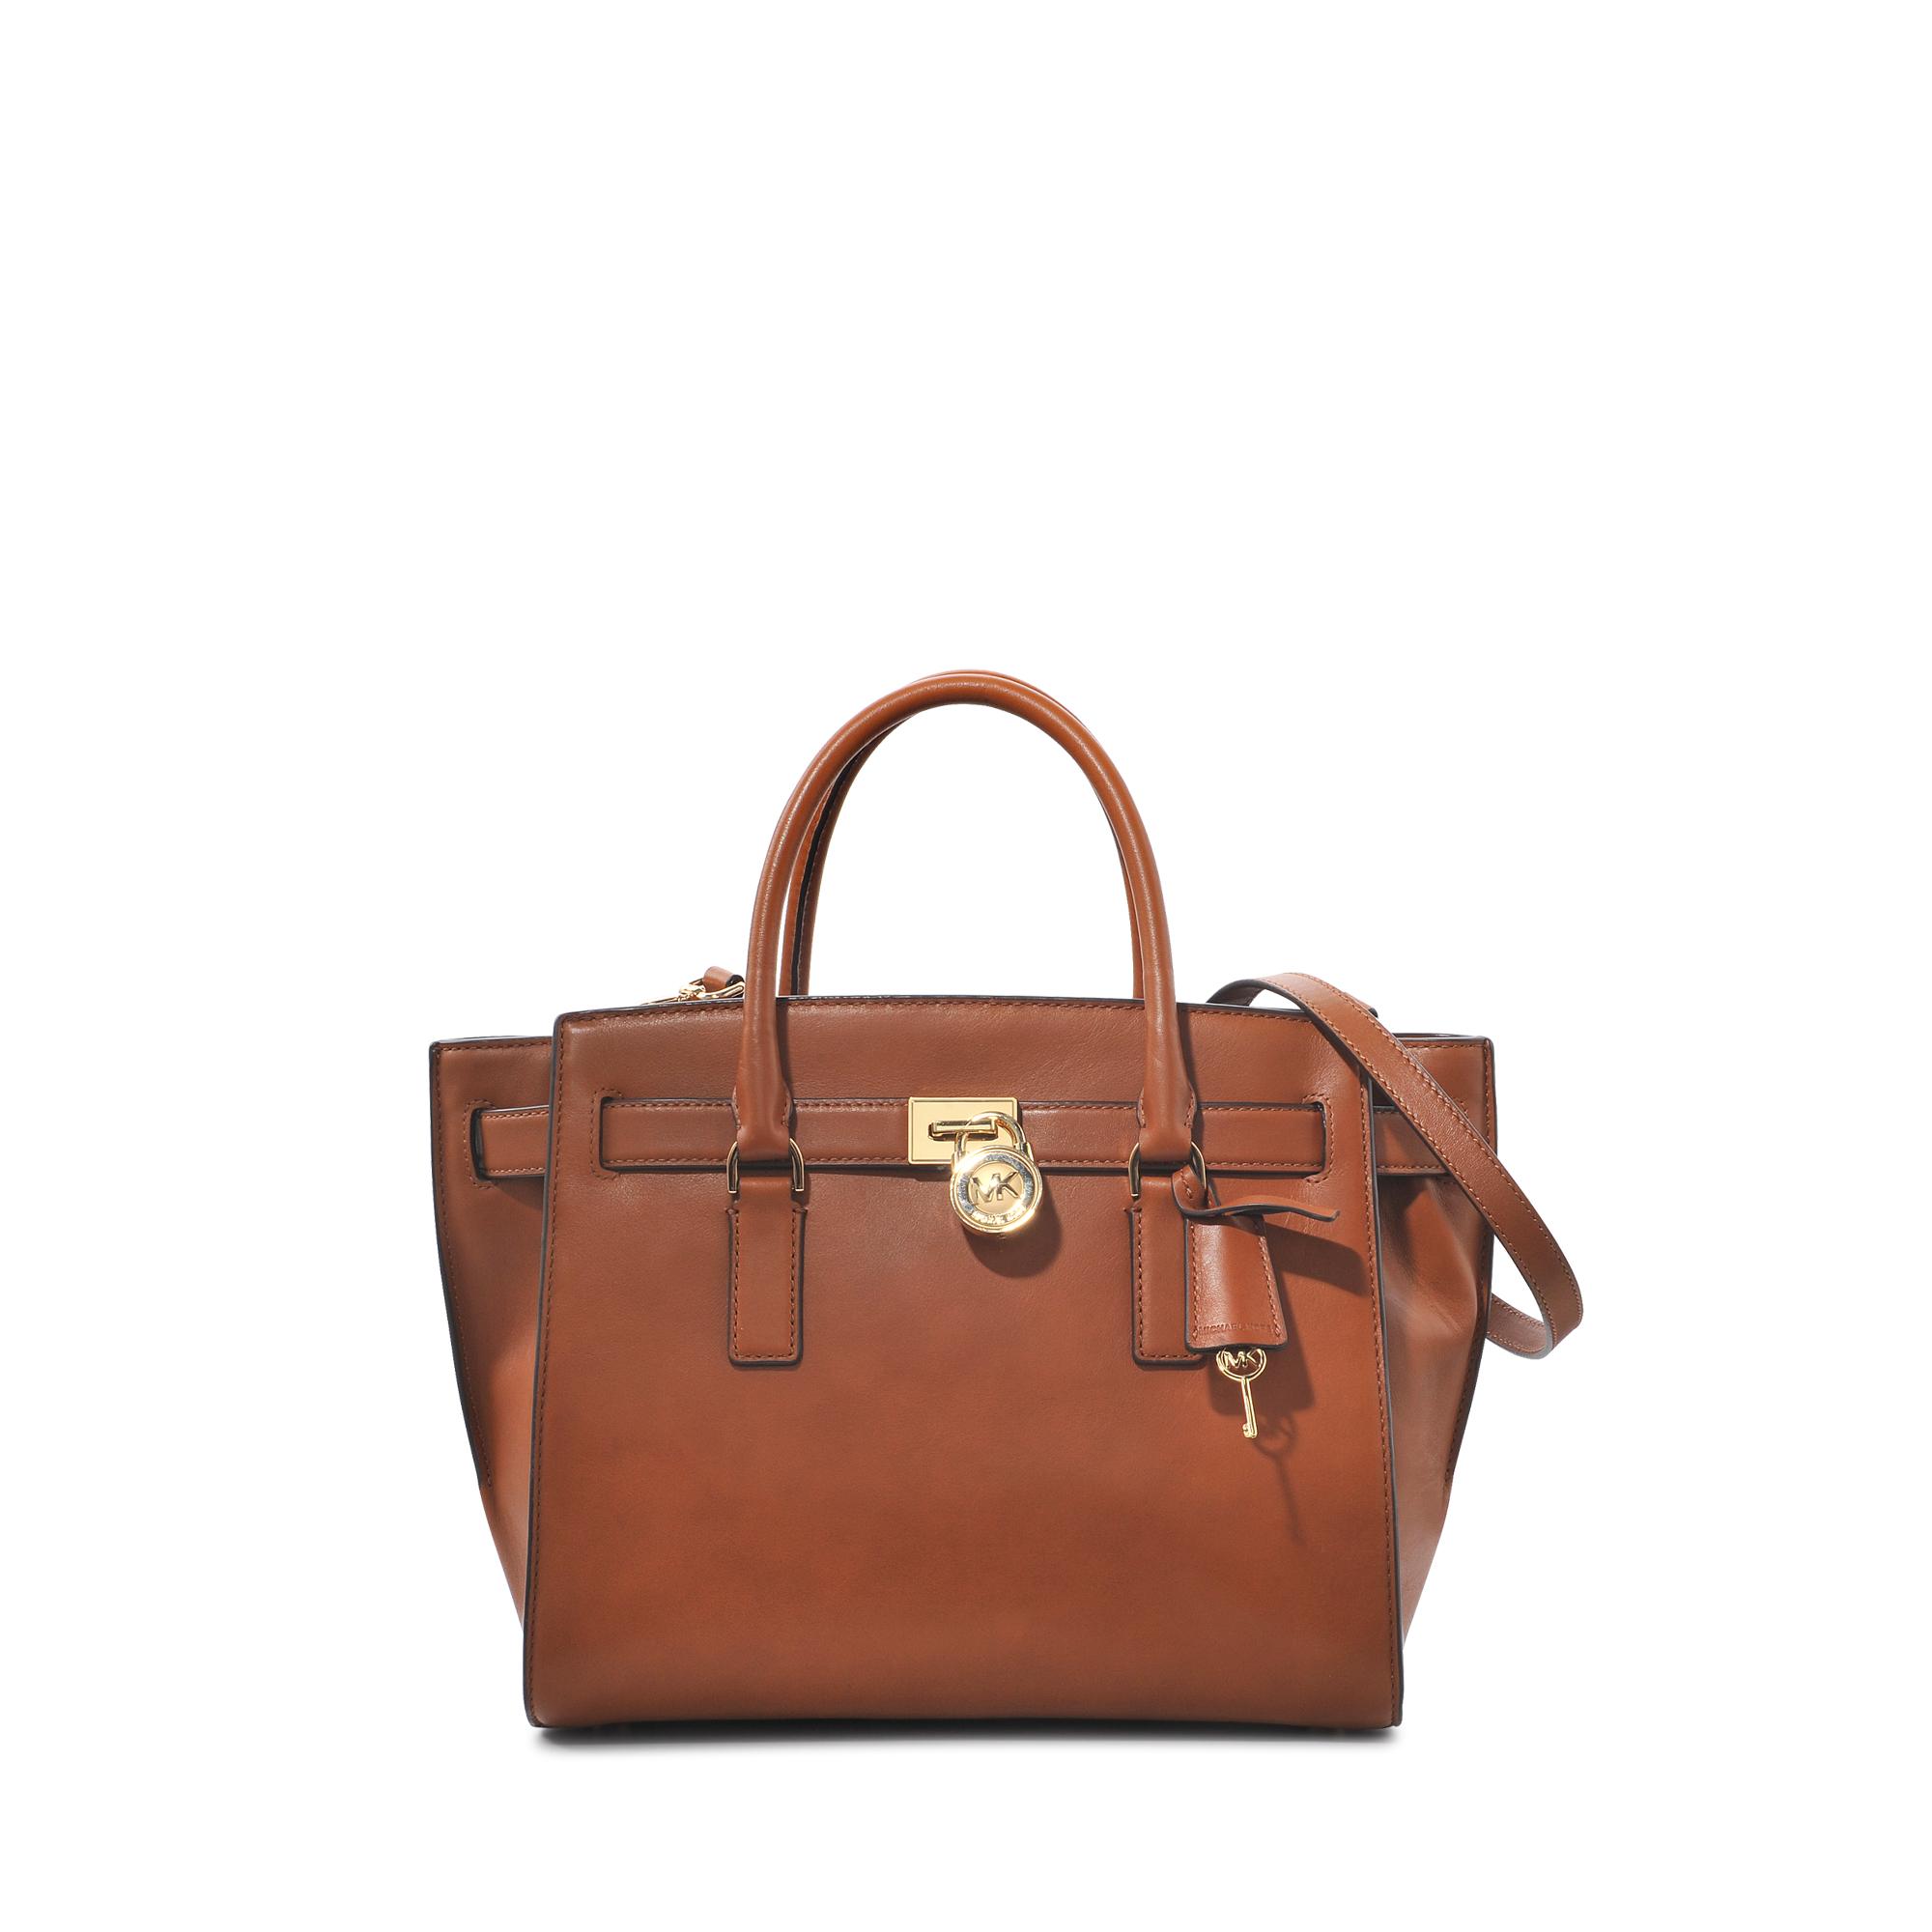 Michael Kors Hamilton Traveler Bag